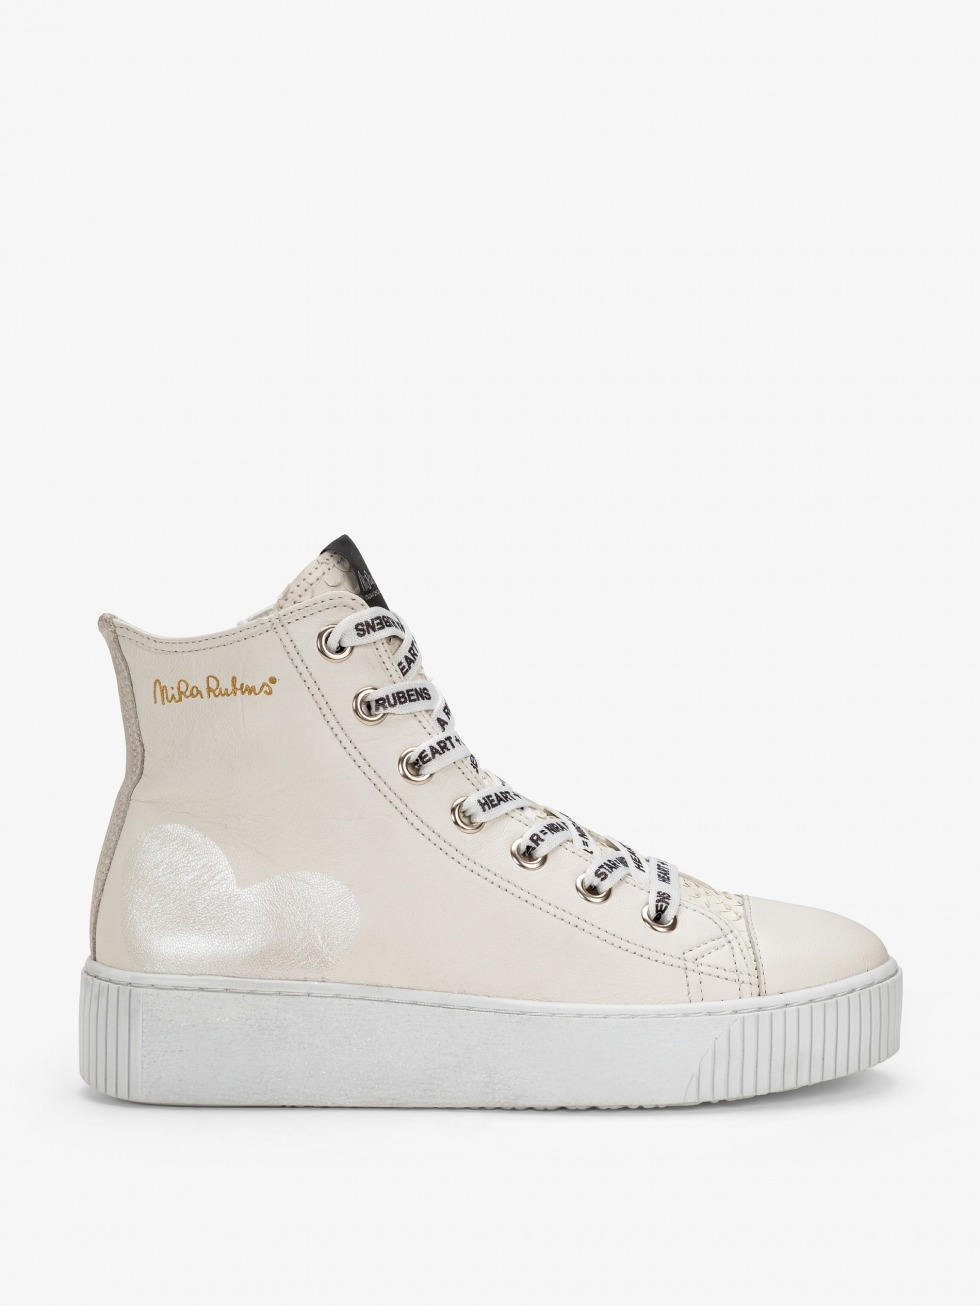 Long Island Sneakers - White Python Heart